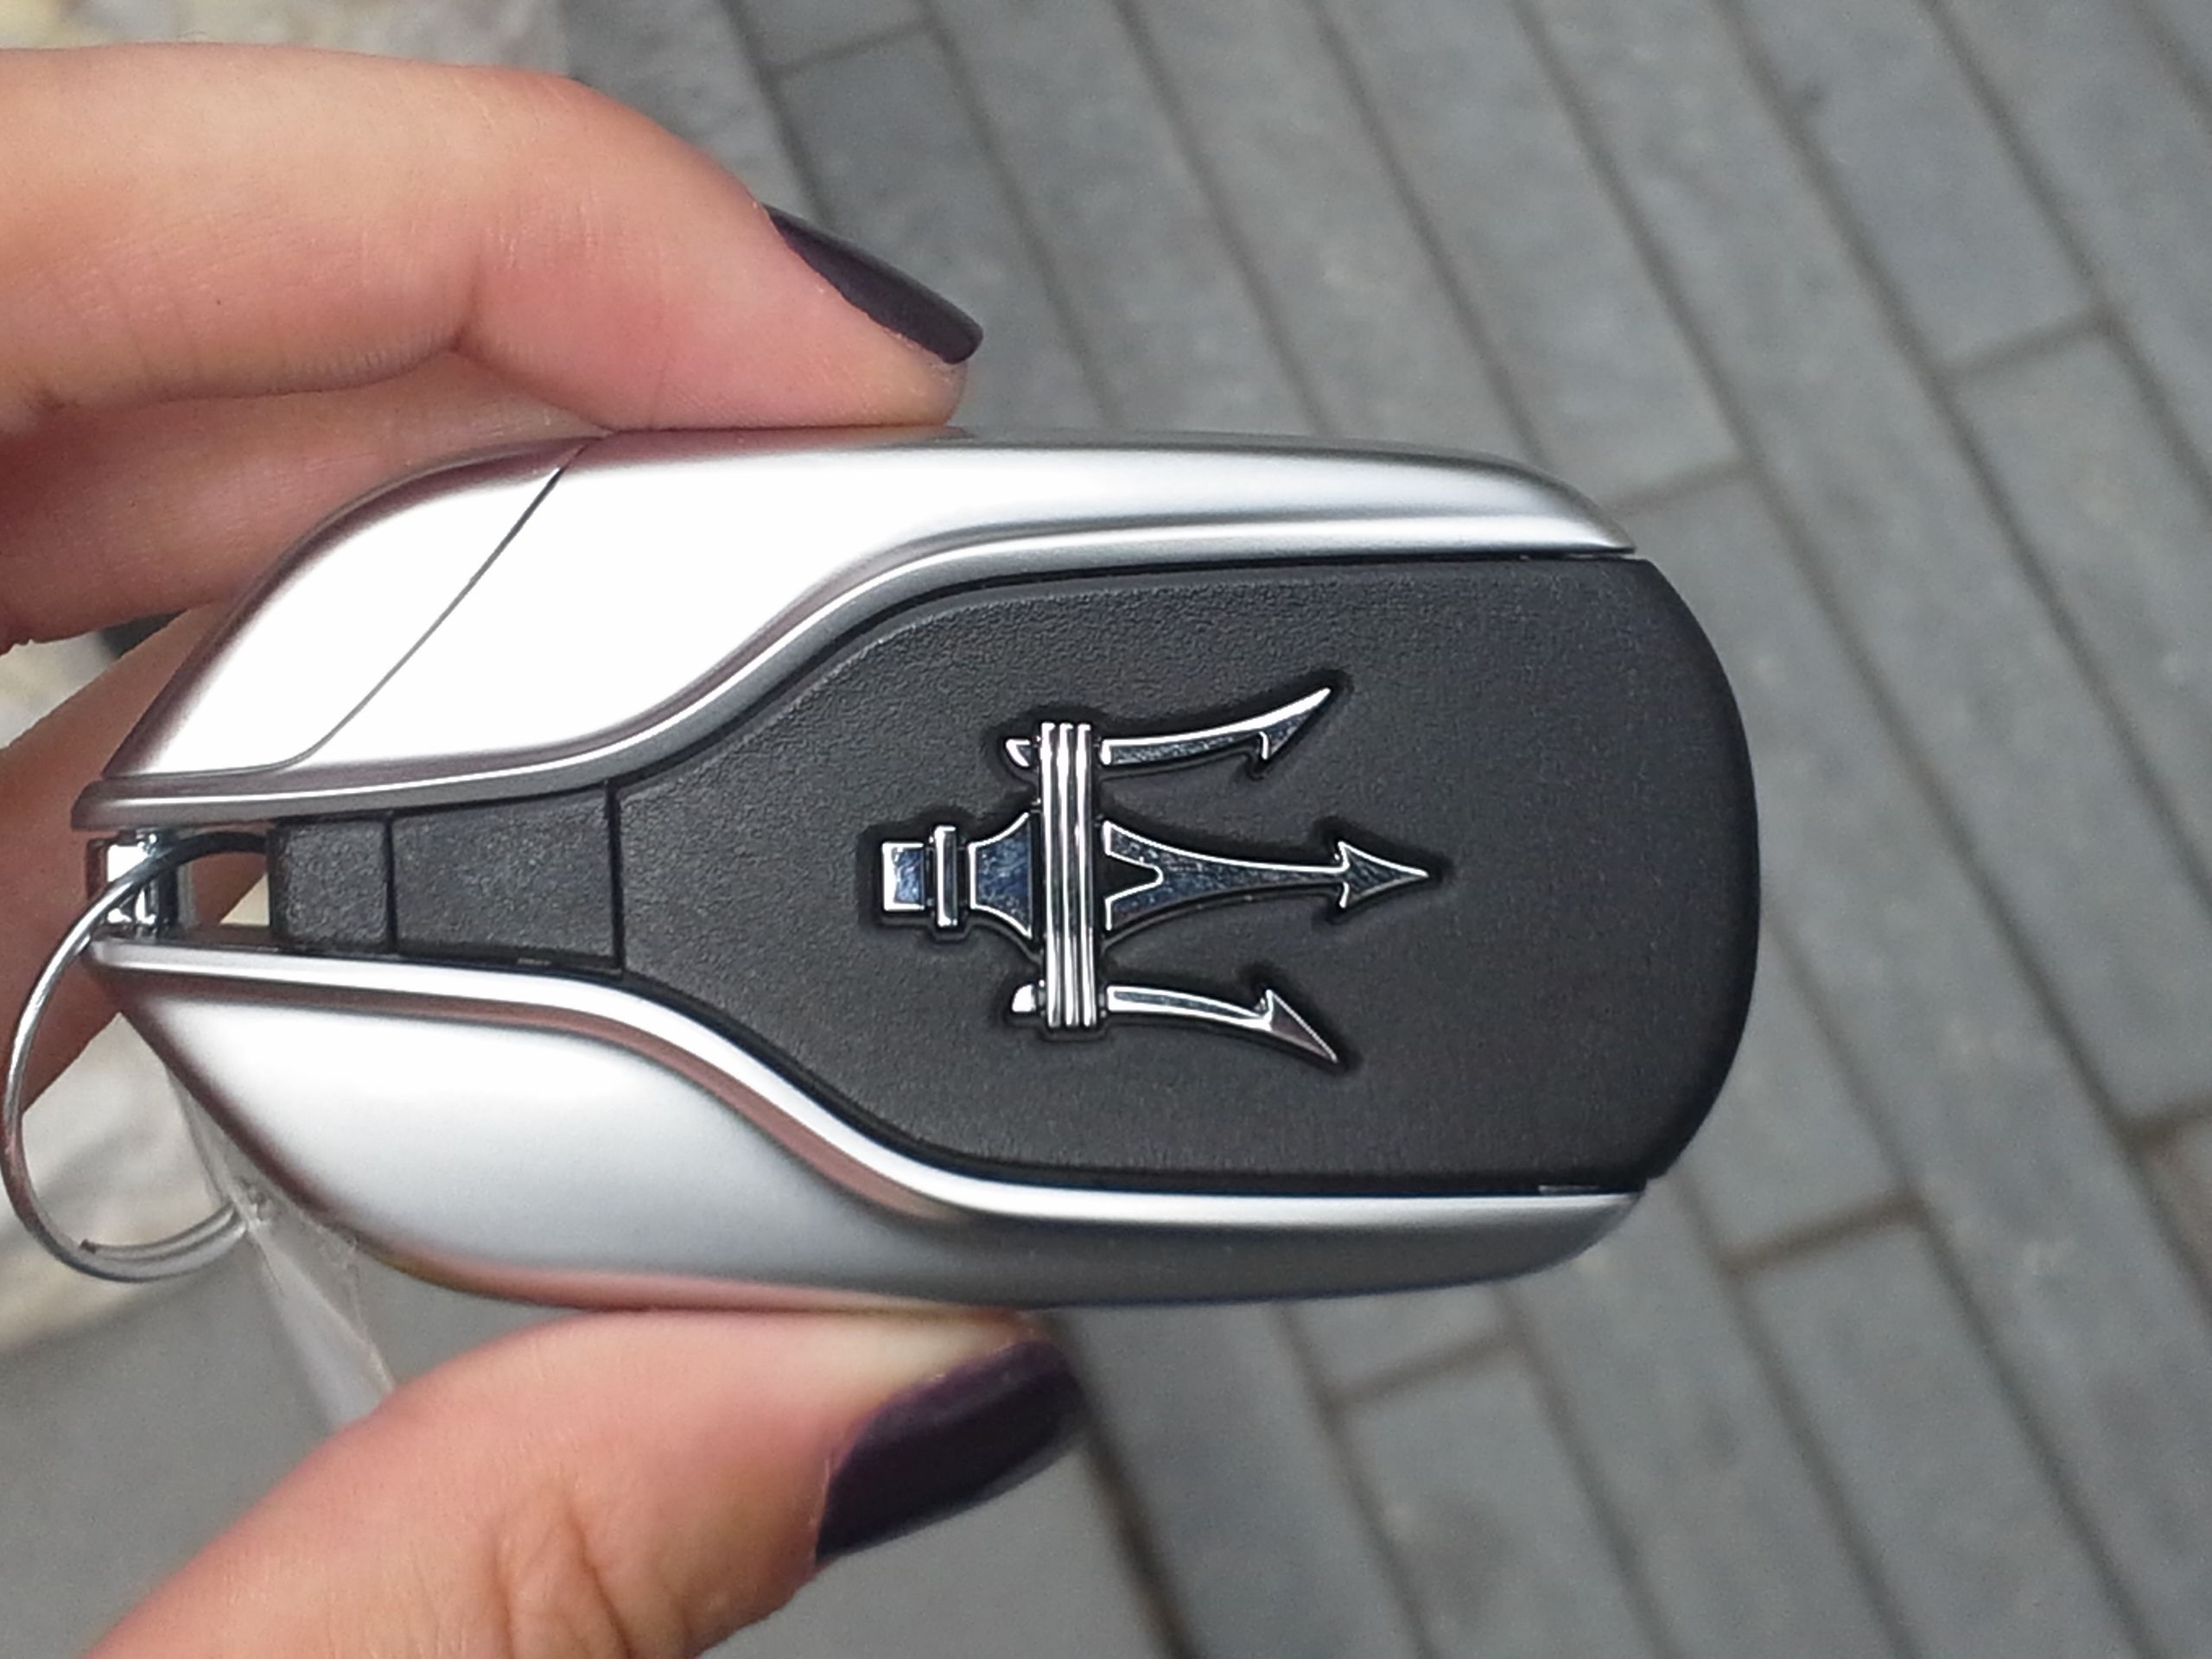 Me holding the Maserati key and thinking of committing ...